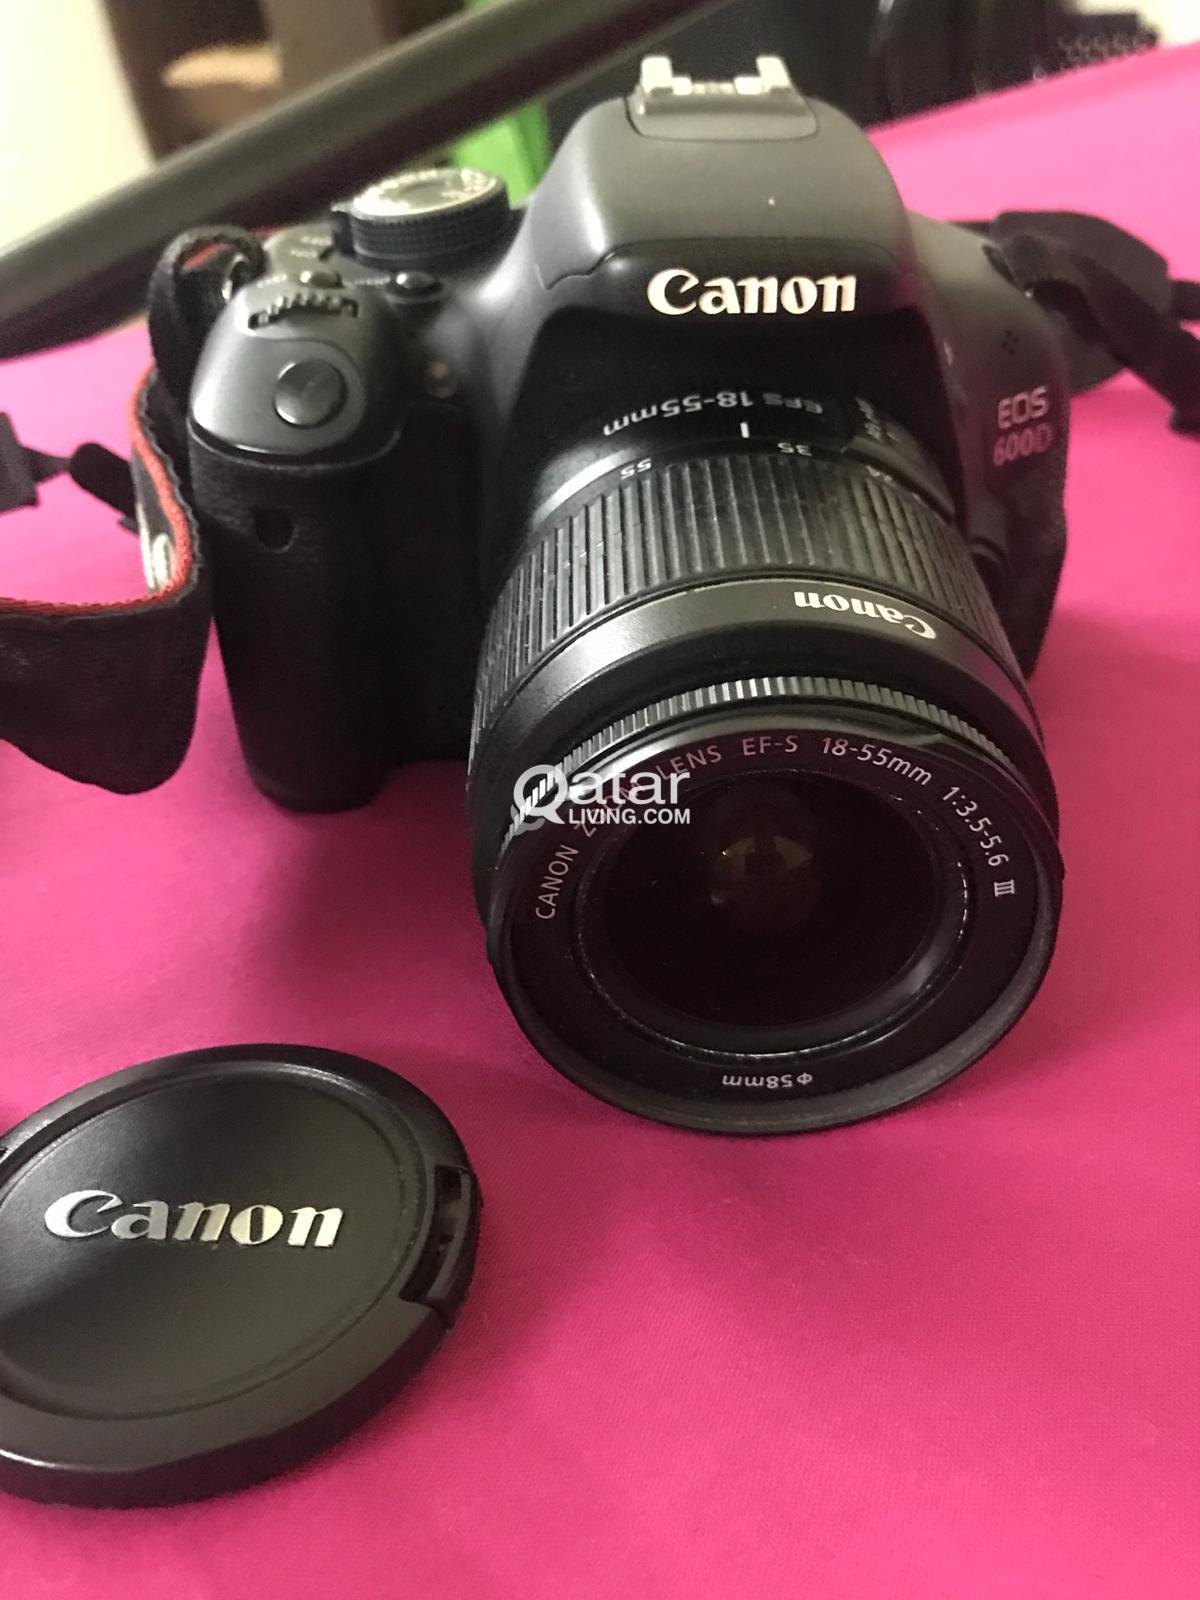 Canon Eos 600d Dslr For Sale Qatar Living